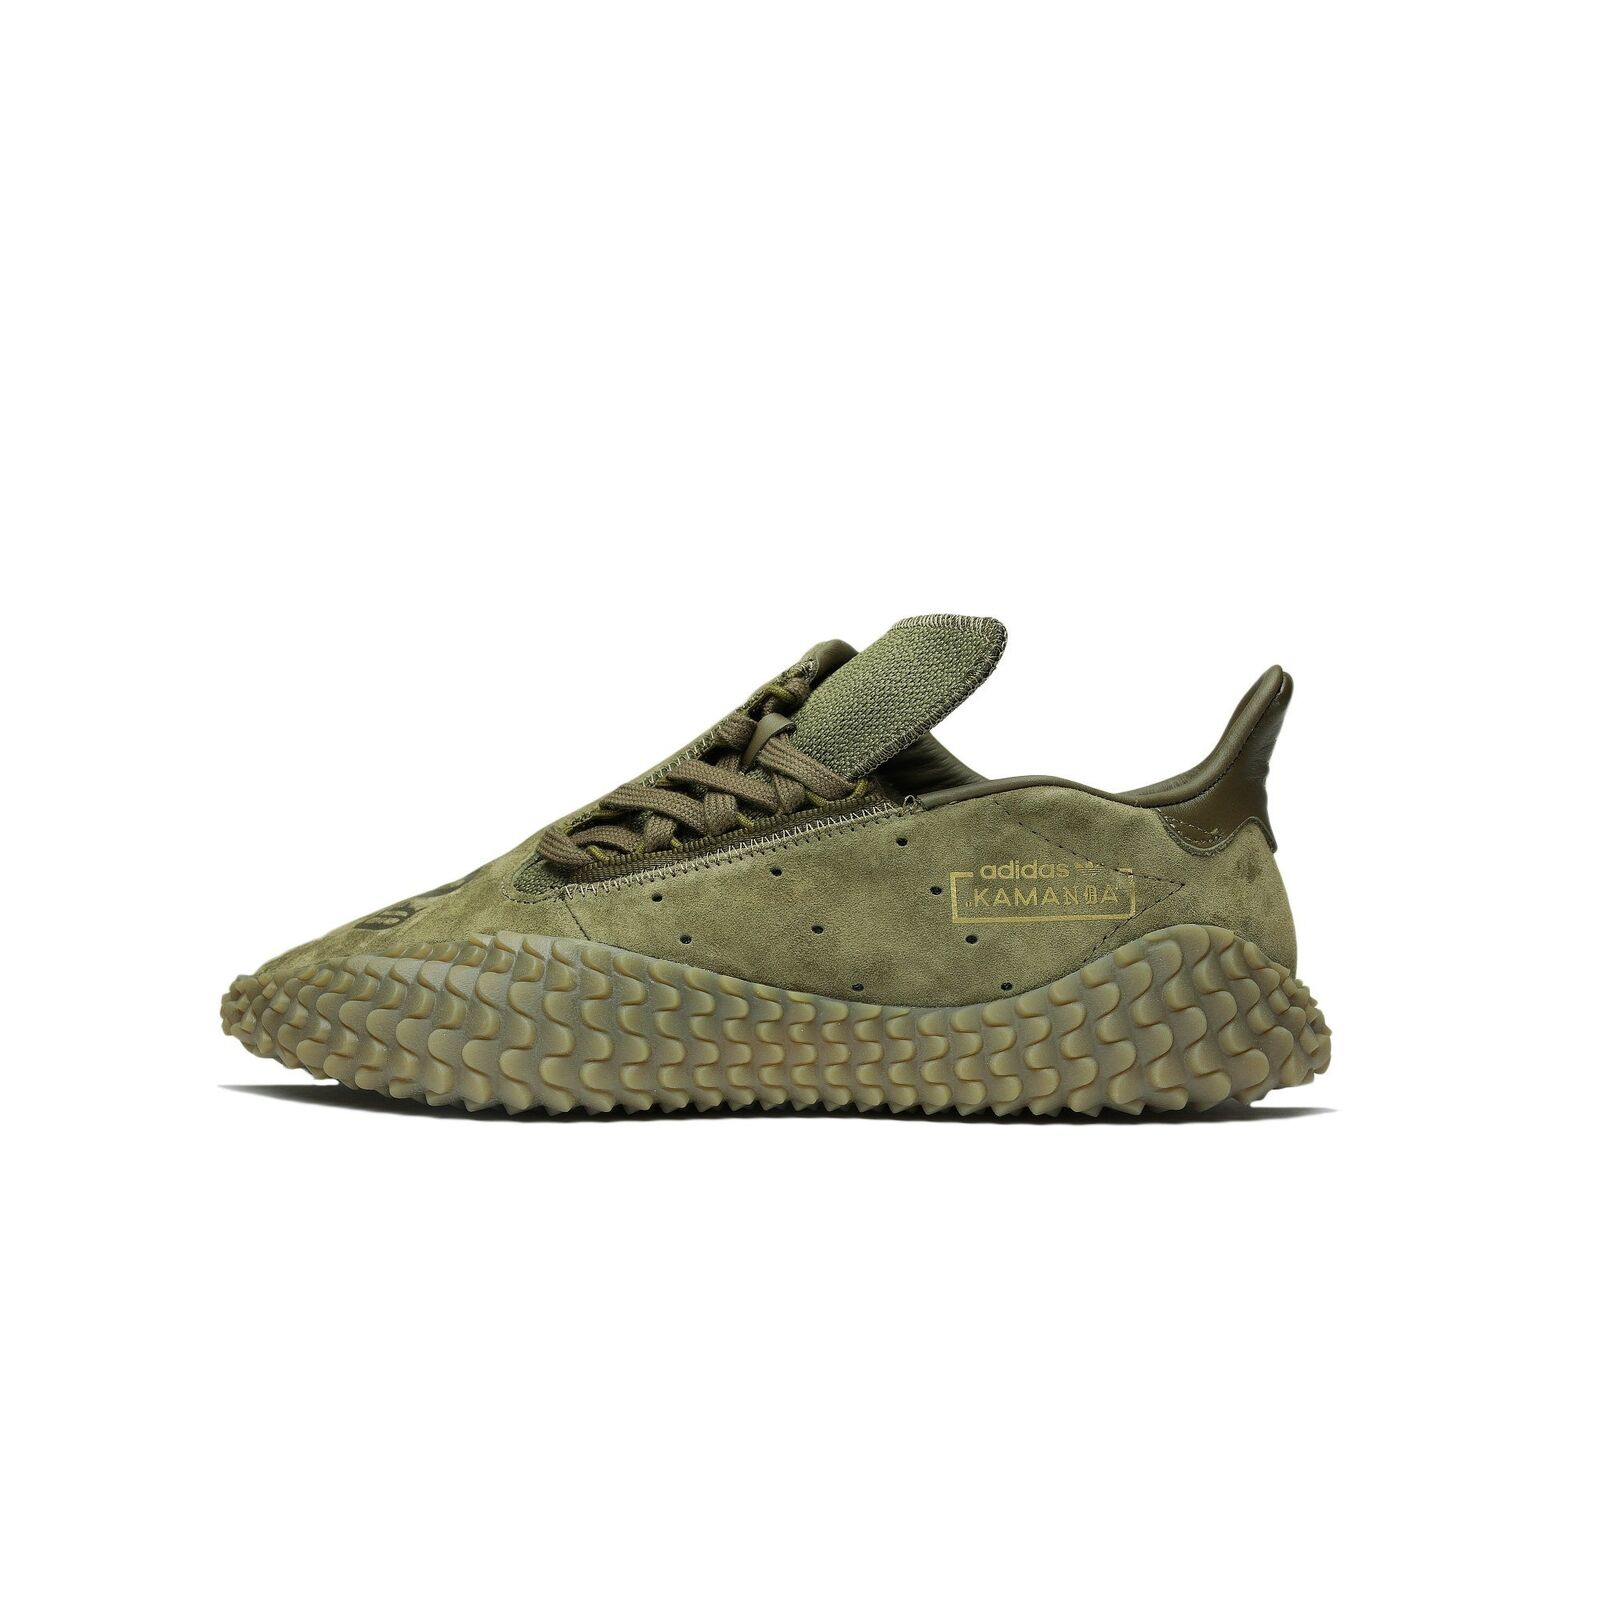 Mens Adidas x x x NEIGHBORHOOD Kamanda 01 Dark Olive B37340 1f91d7